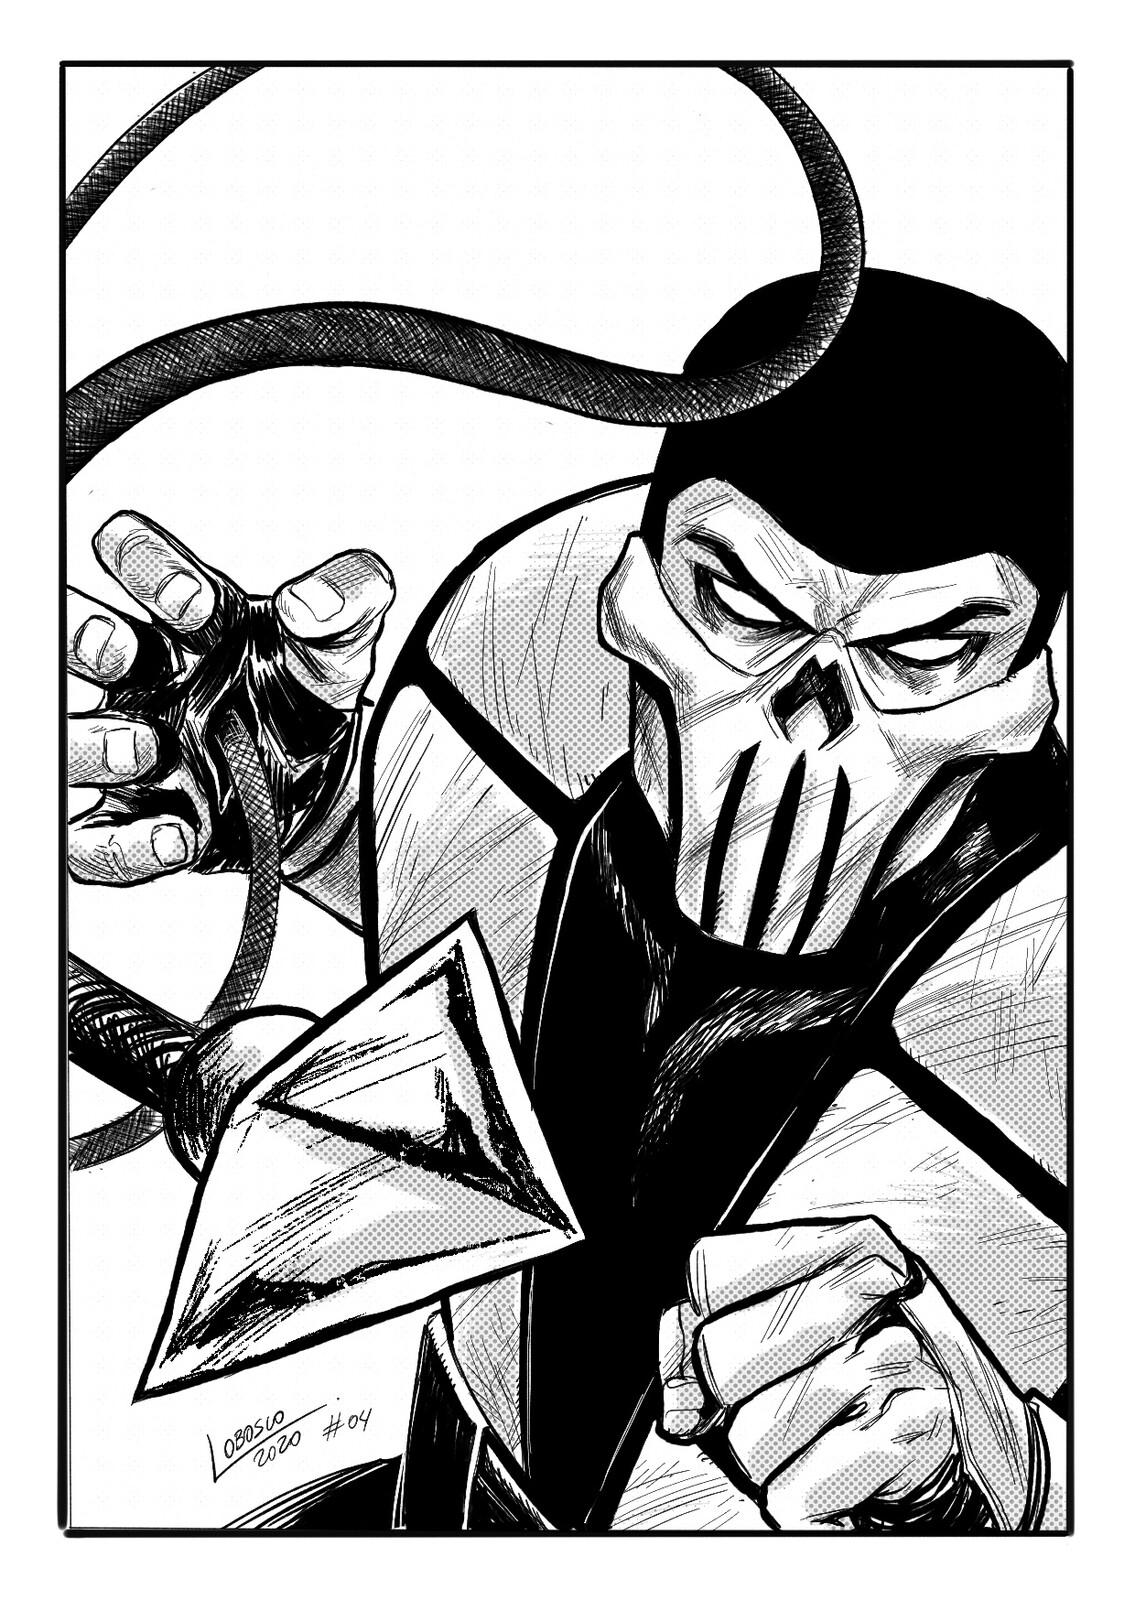 Scorpion - MK 4